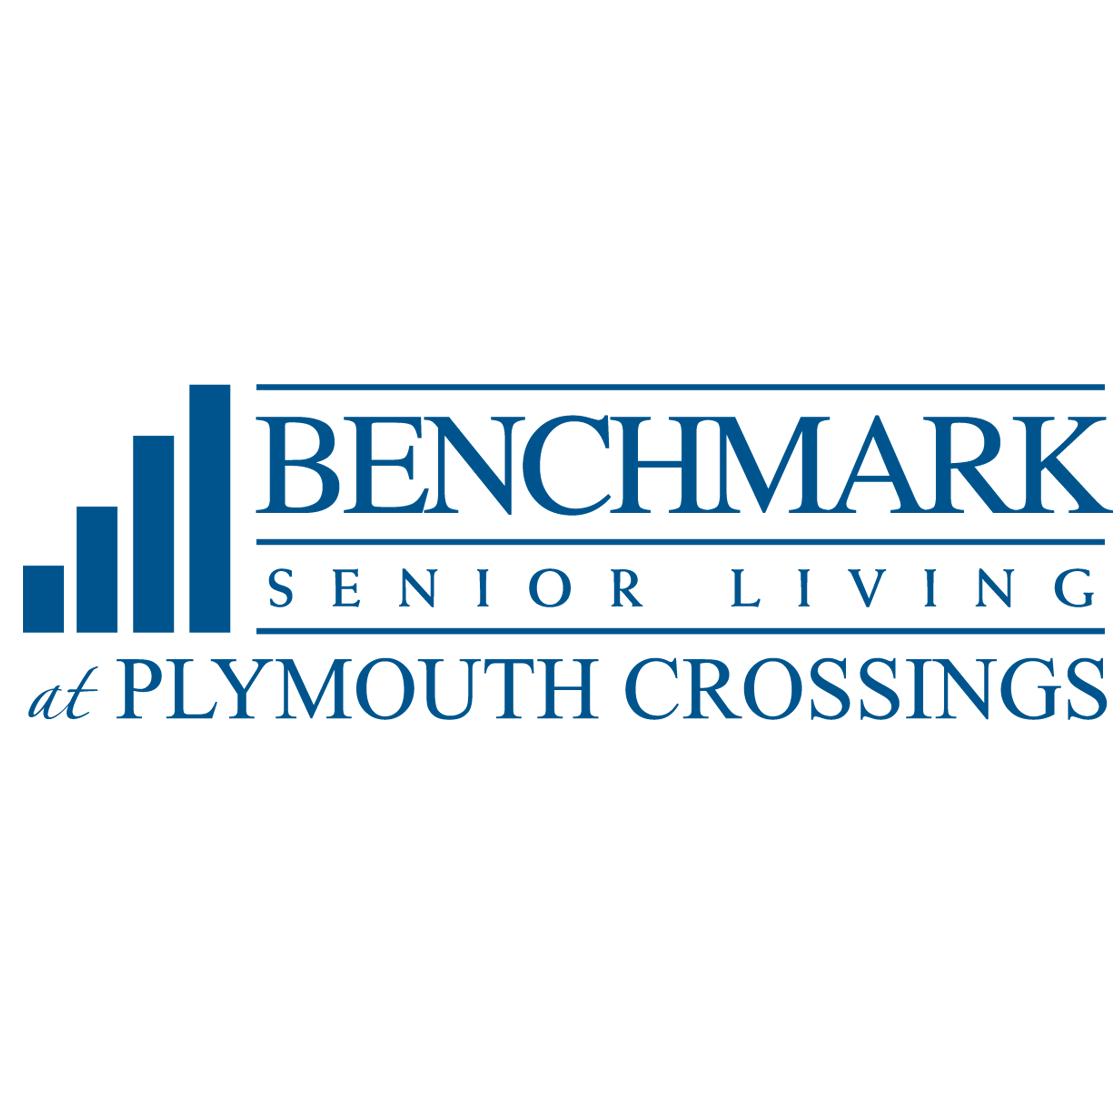 Benchmark Senior Living at Plymouth Crossings